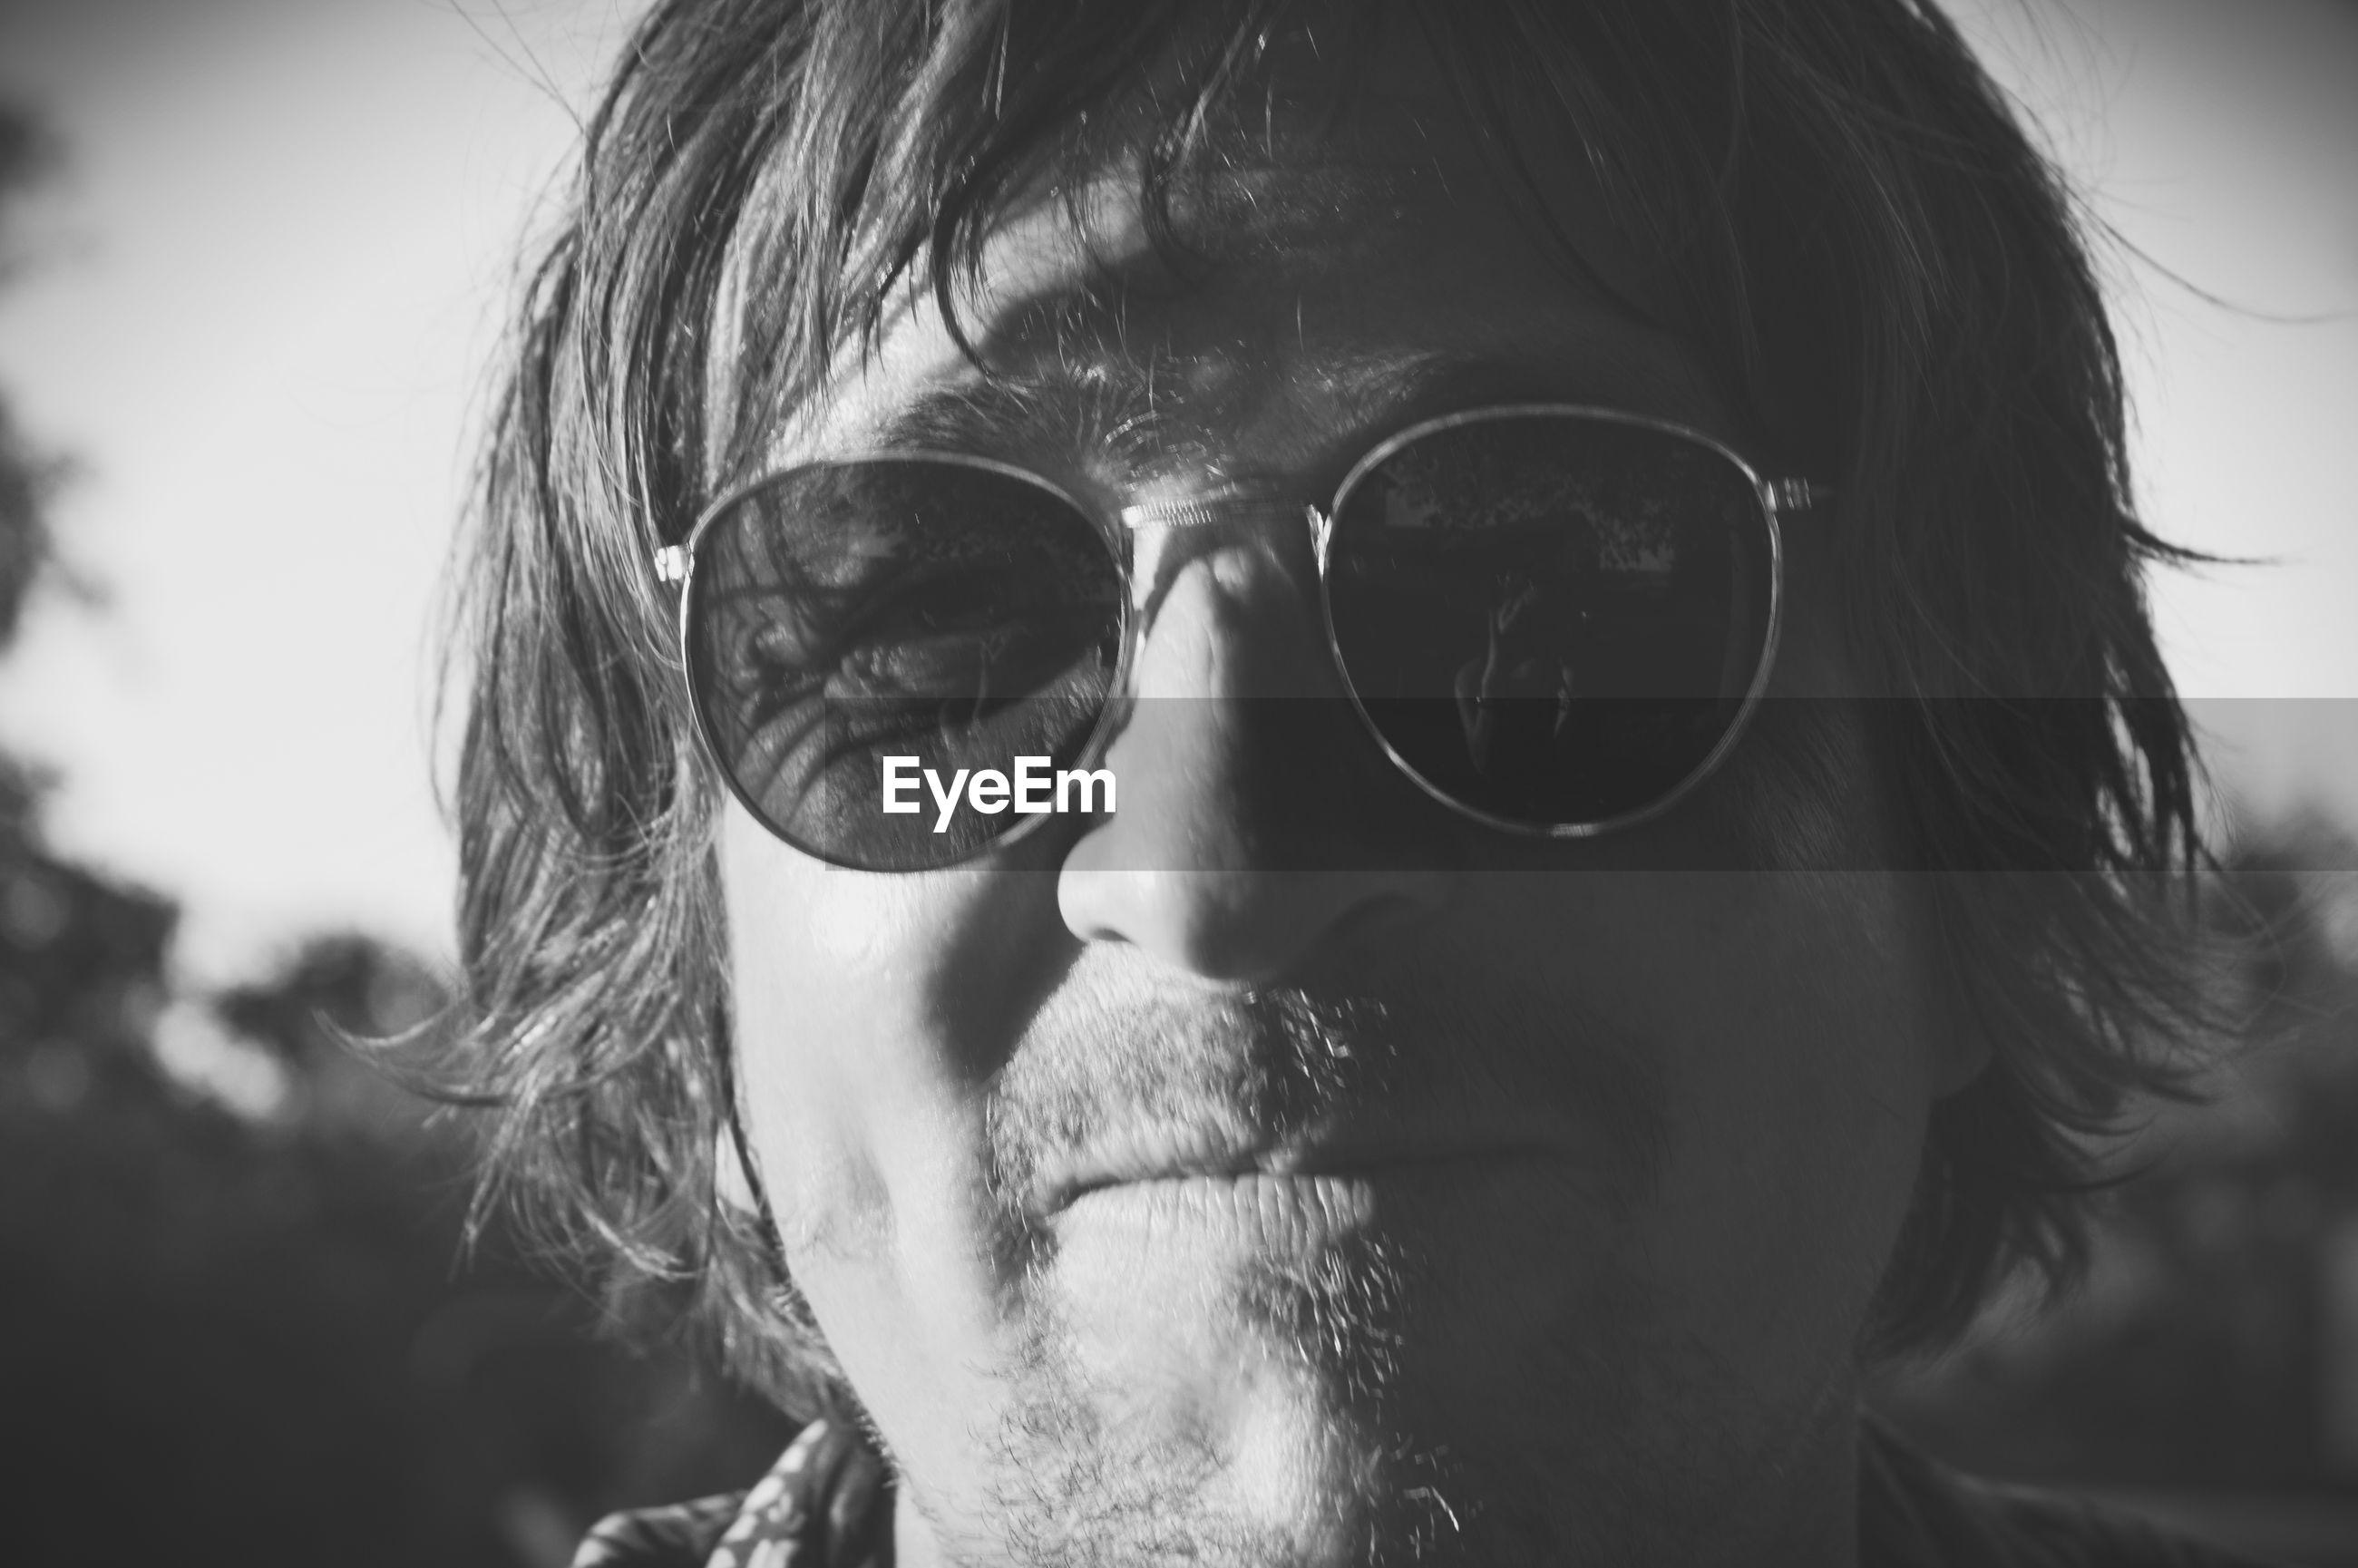 Close-up portrait of man wearing sunglasses